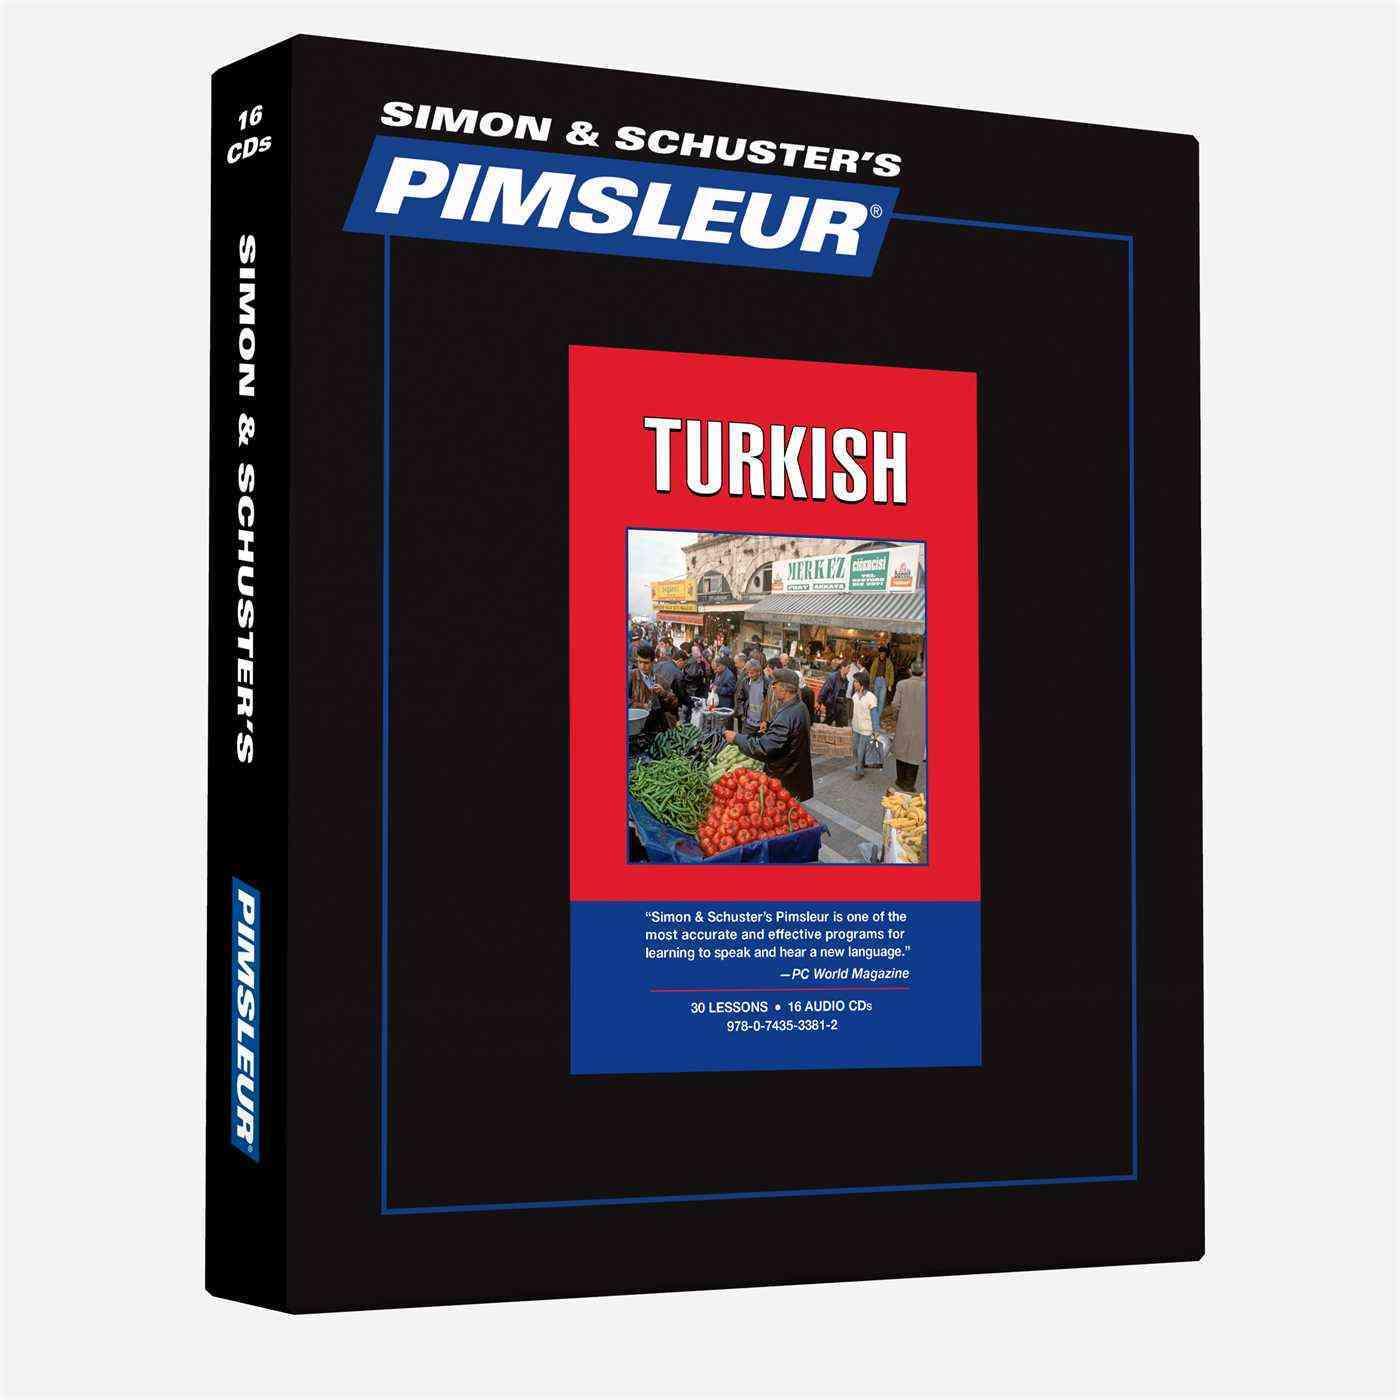 Pimsleur Turkish (CD-Audio)